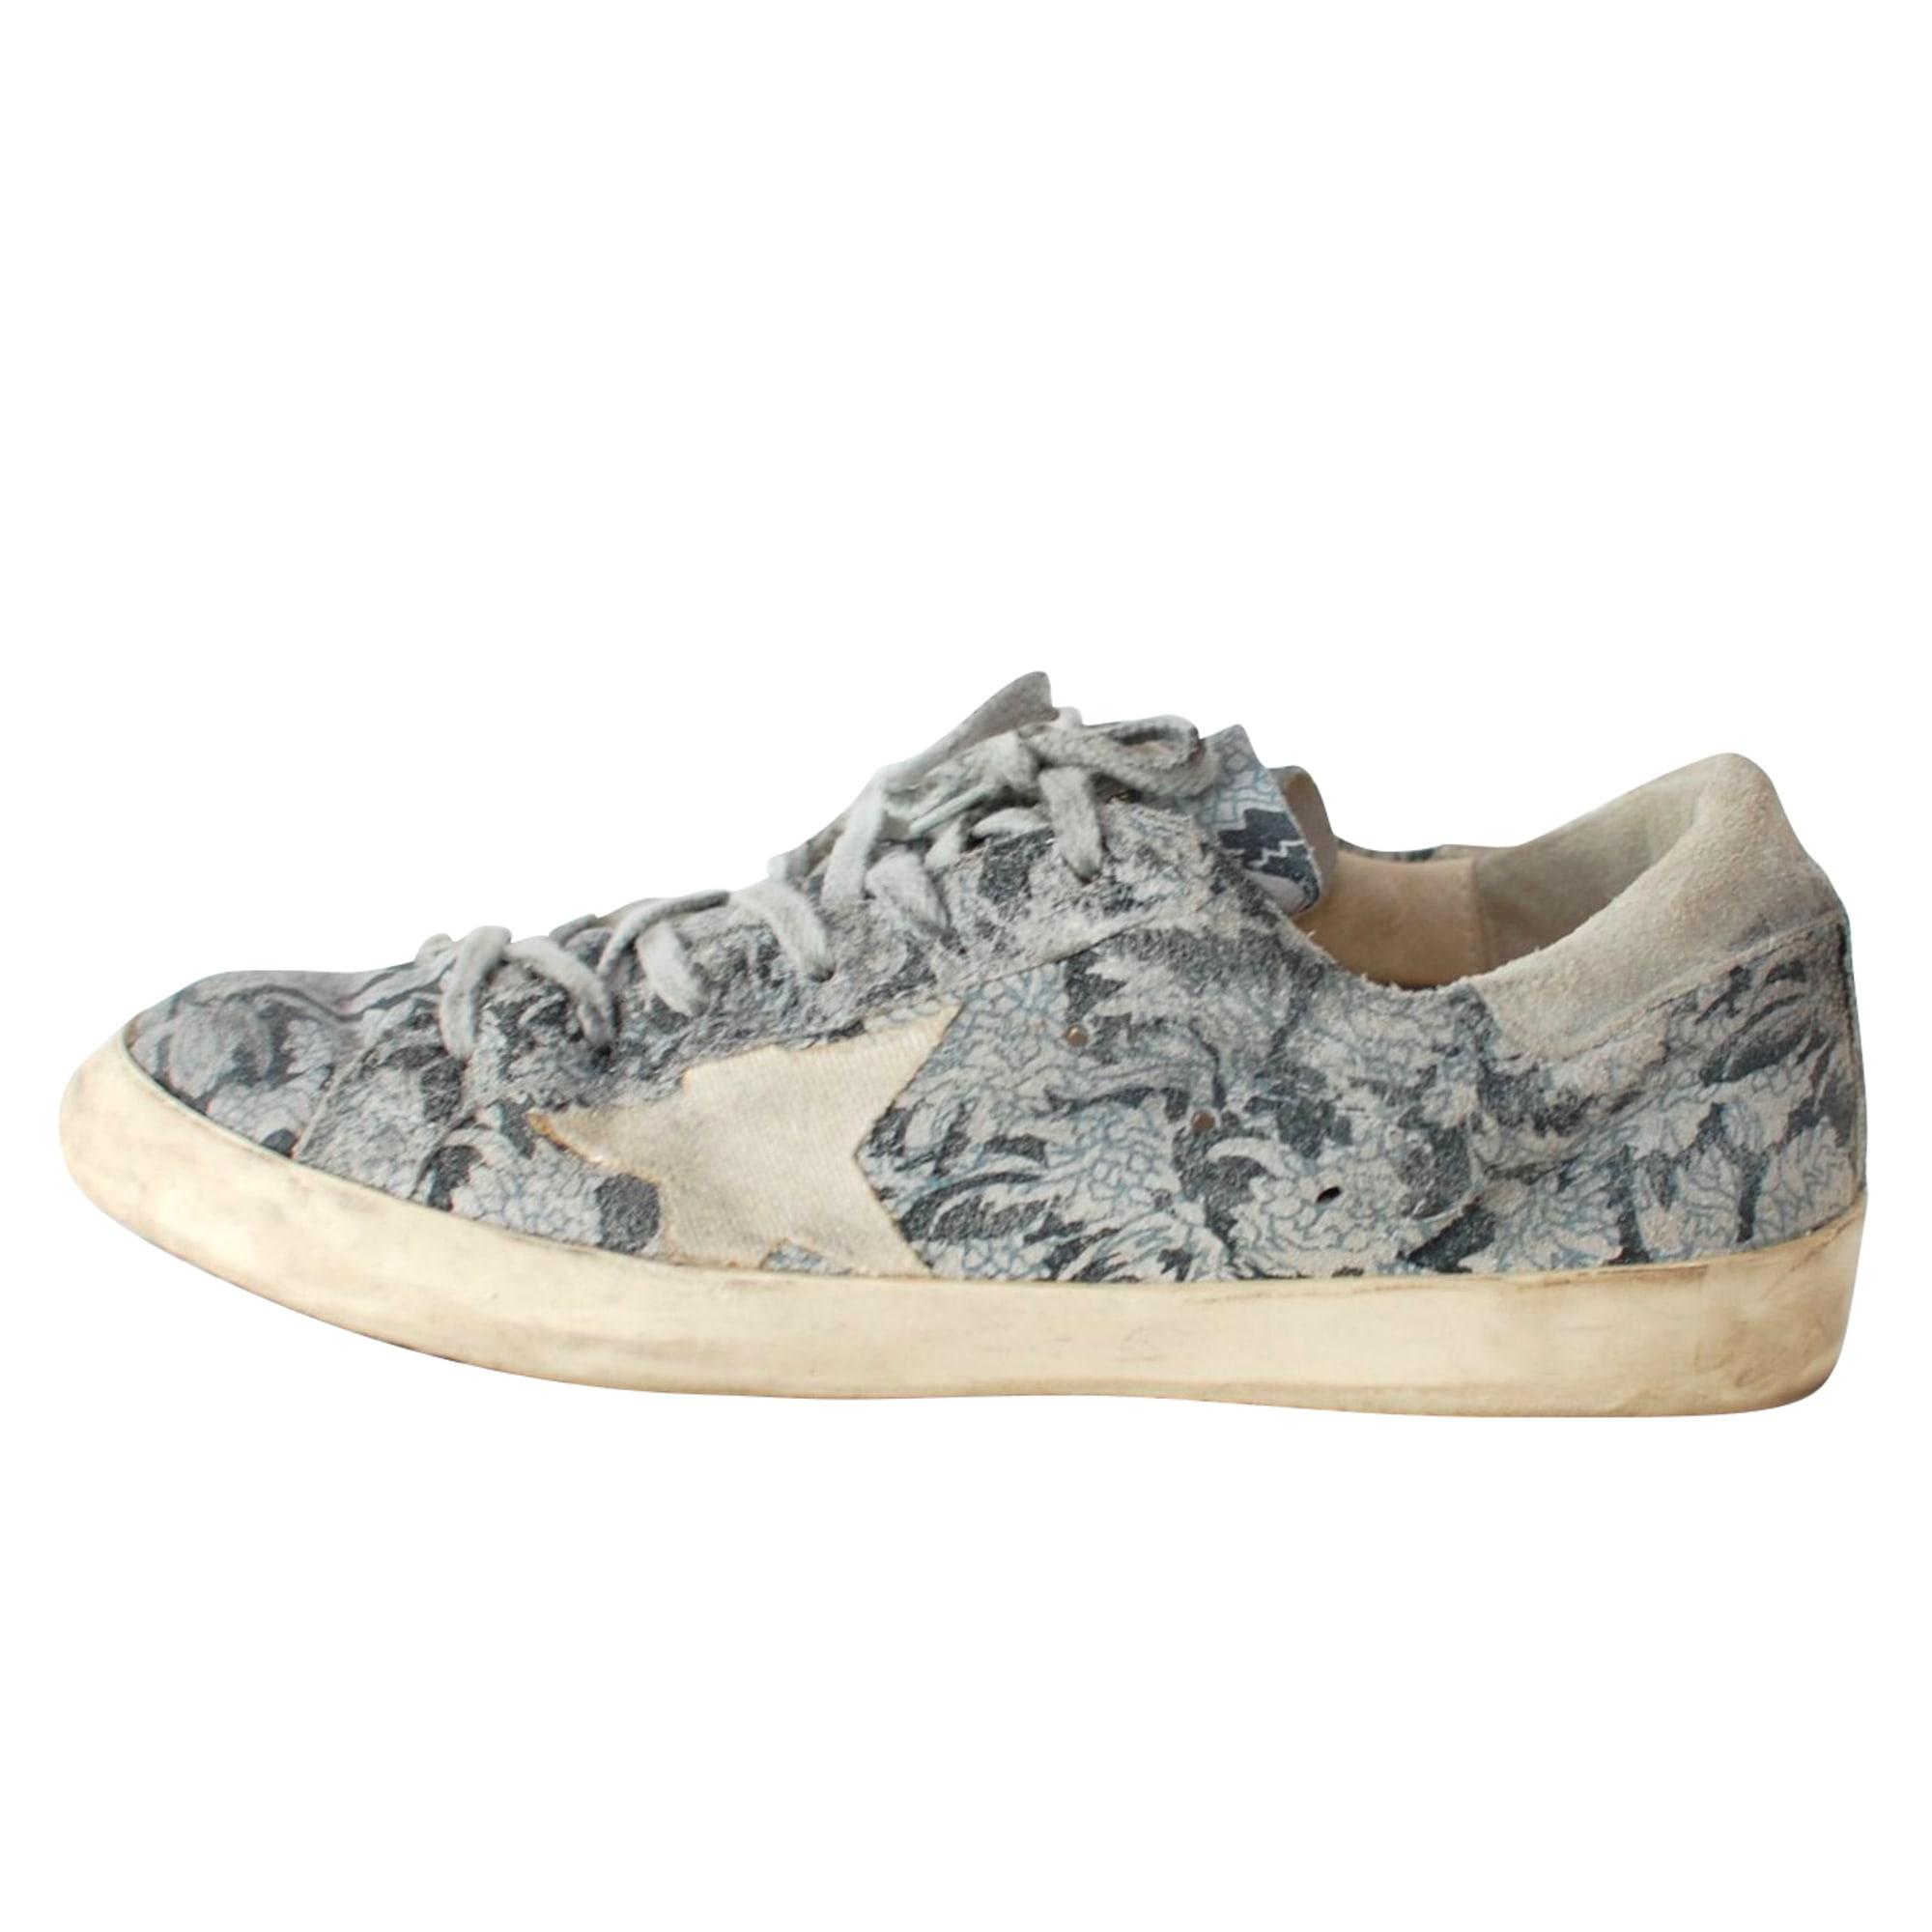 Chaussures de sport GOLDEN GOOSE Gris, anthracite